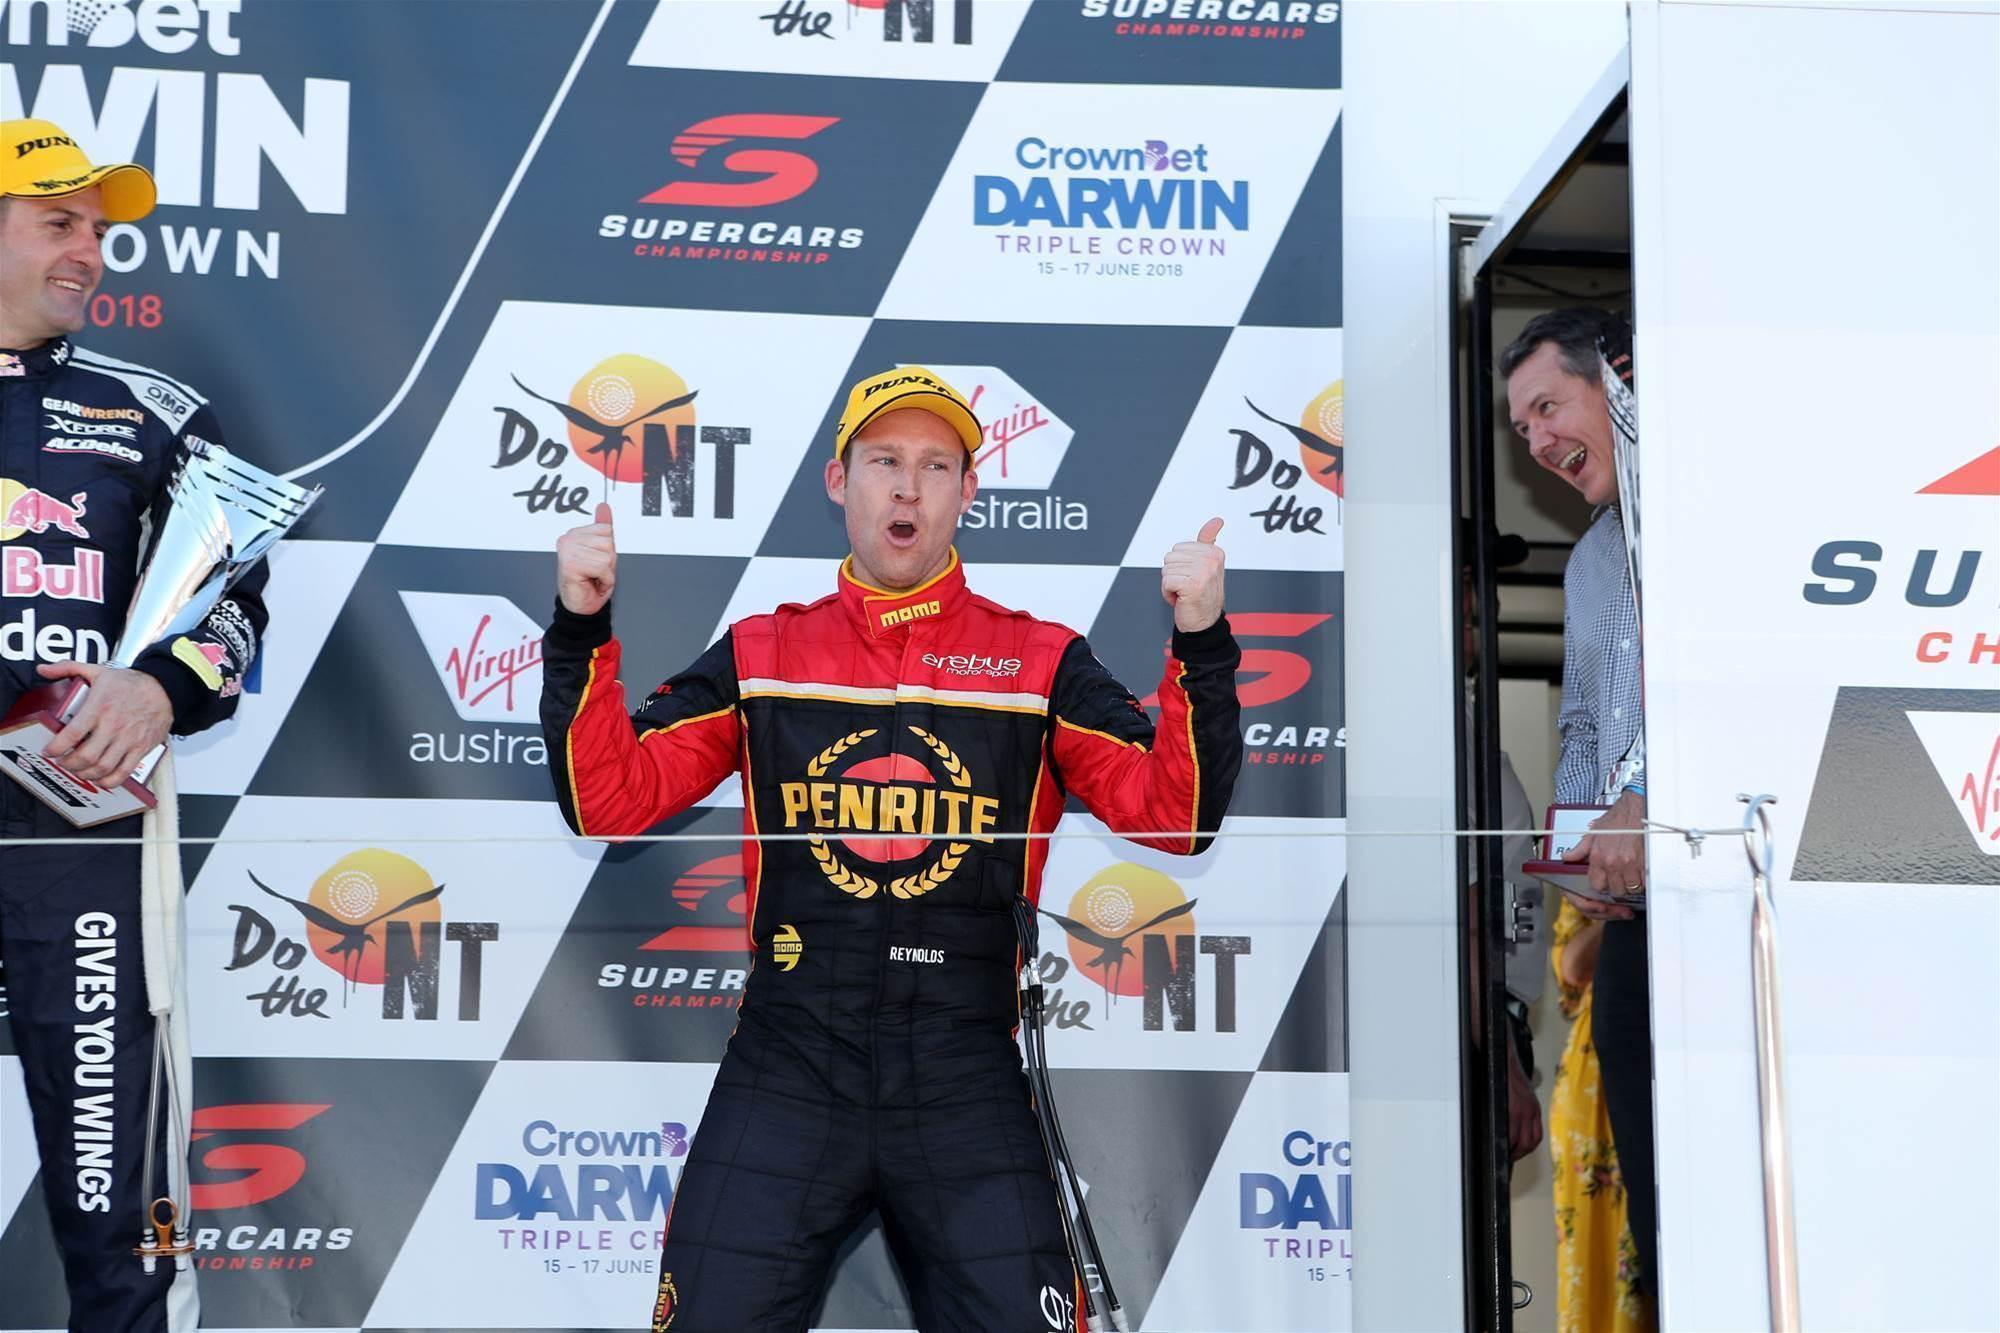 Reynolds triumphs in top end